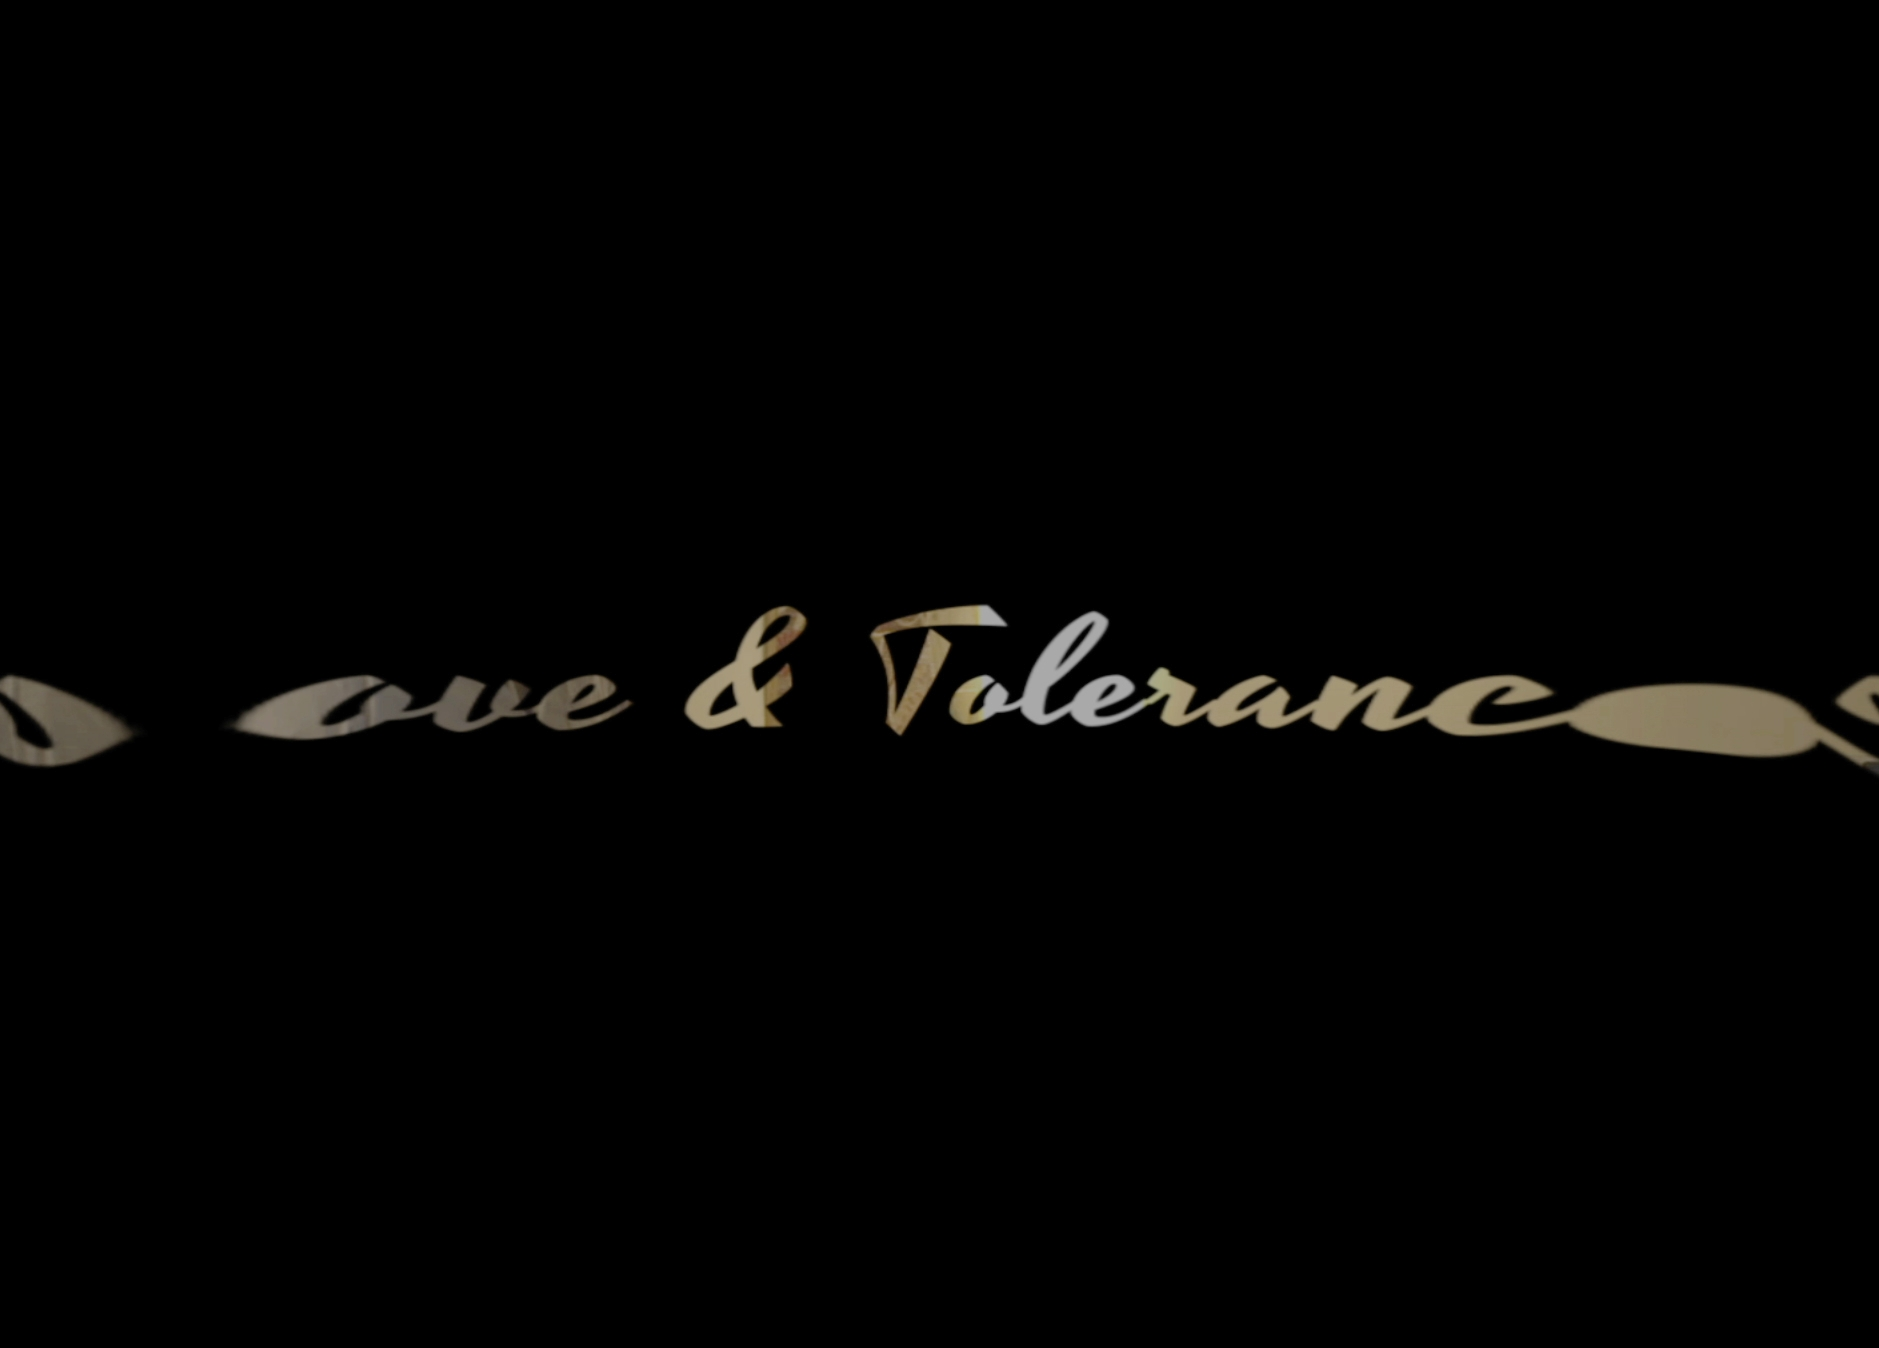 Love & Tolerance